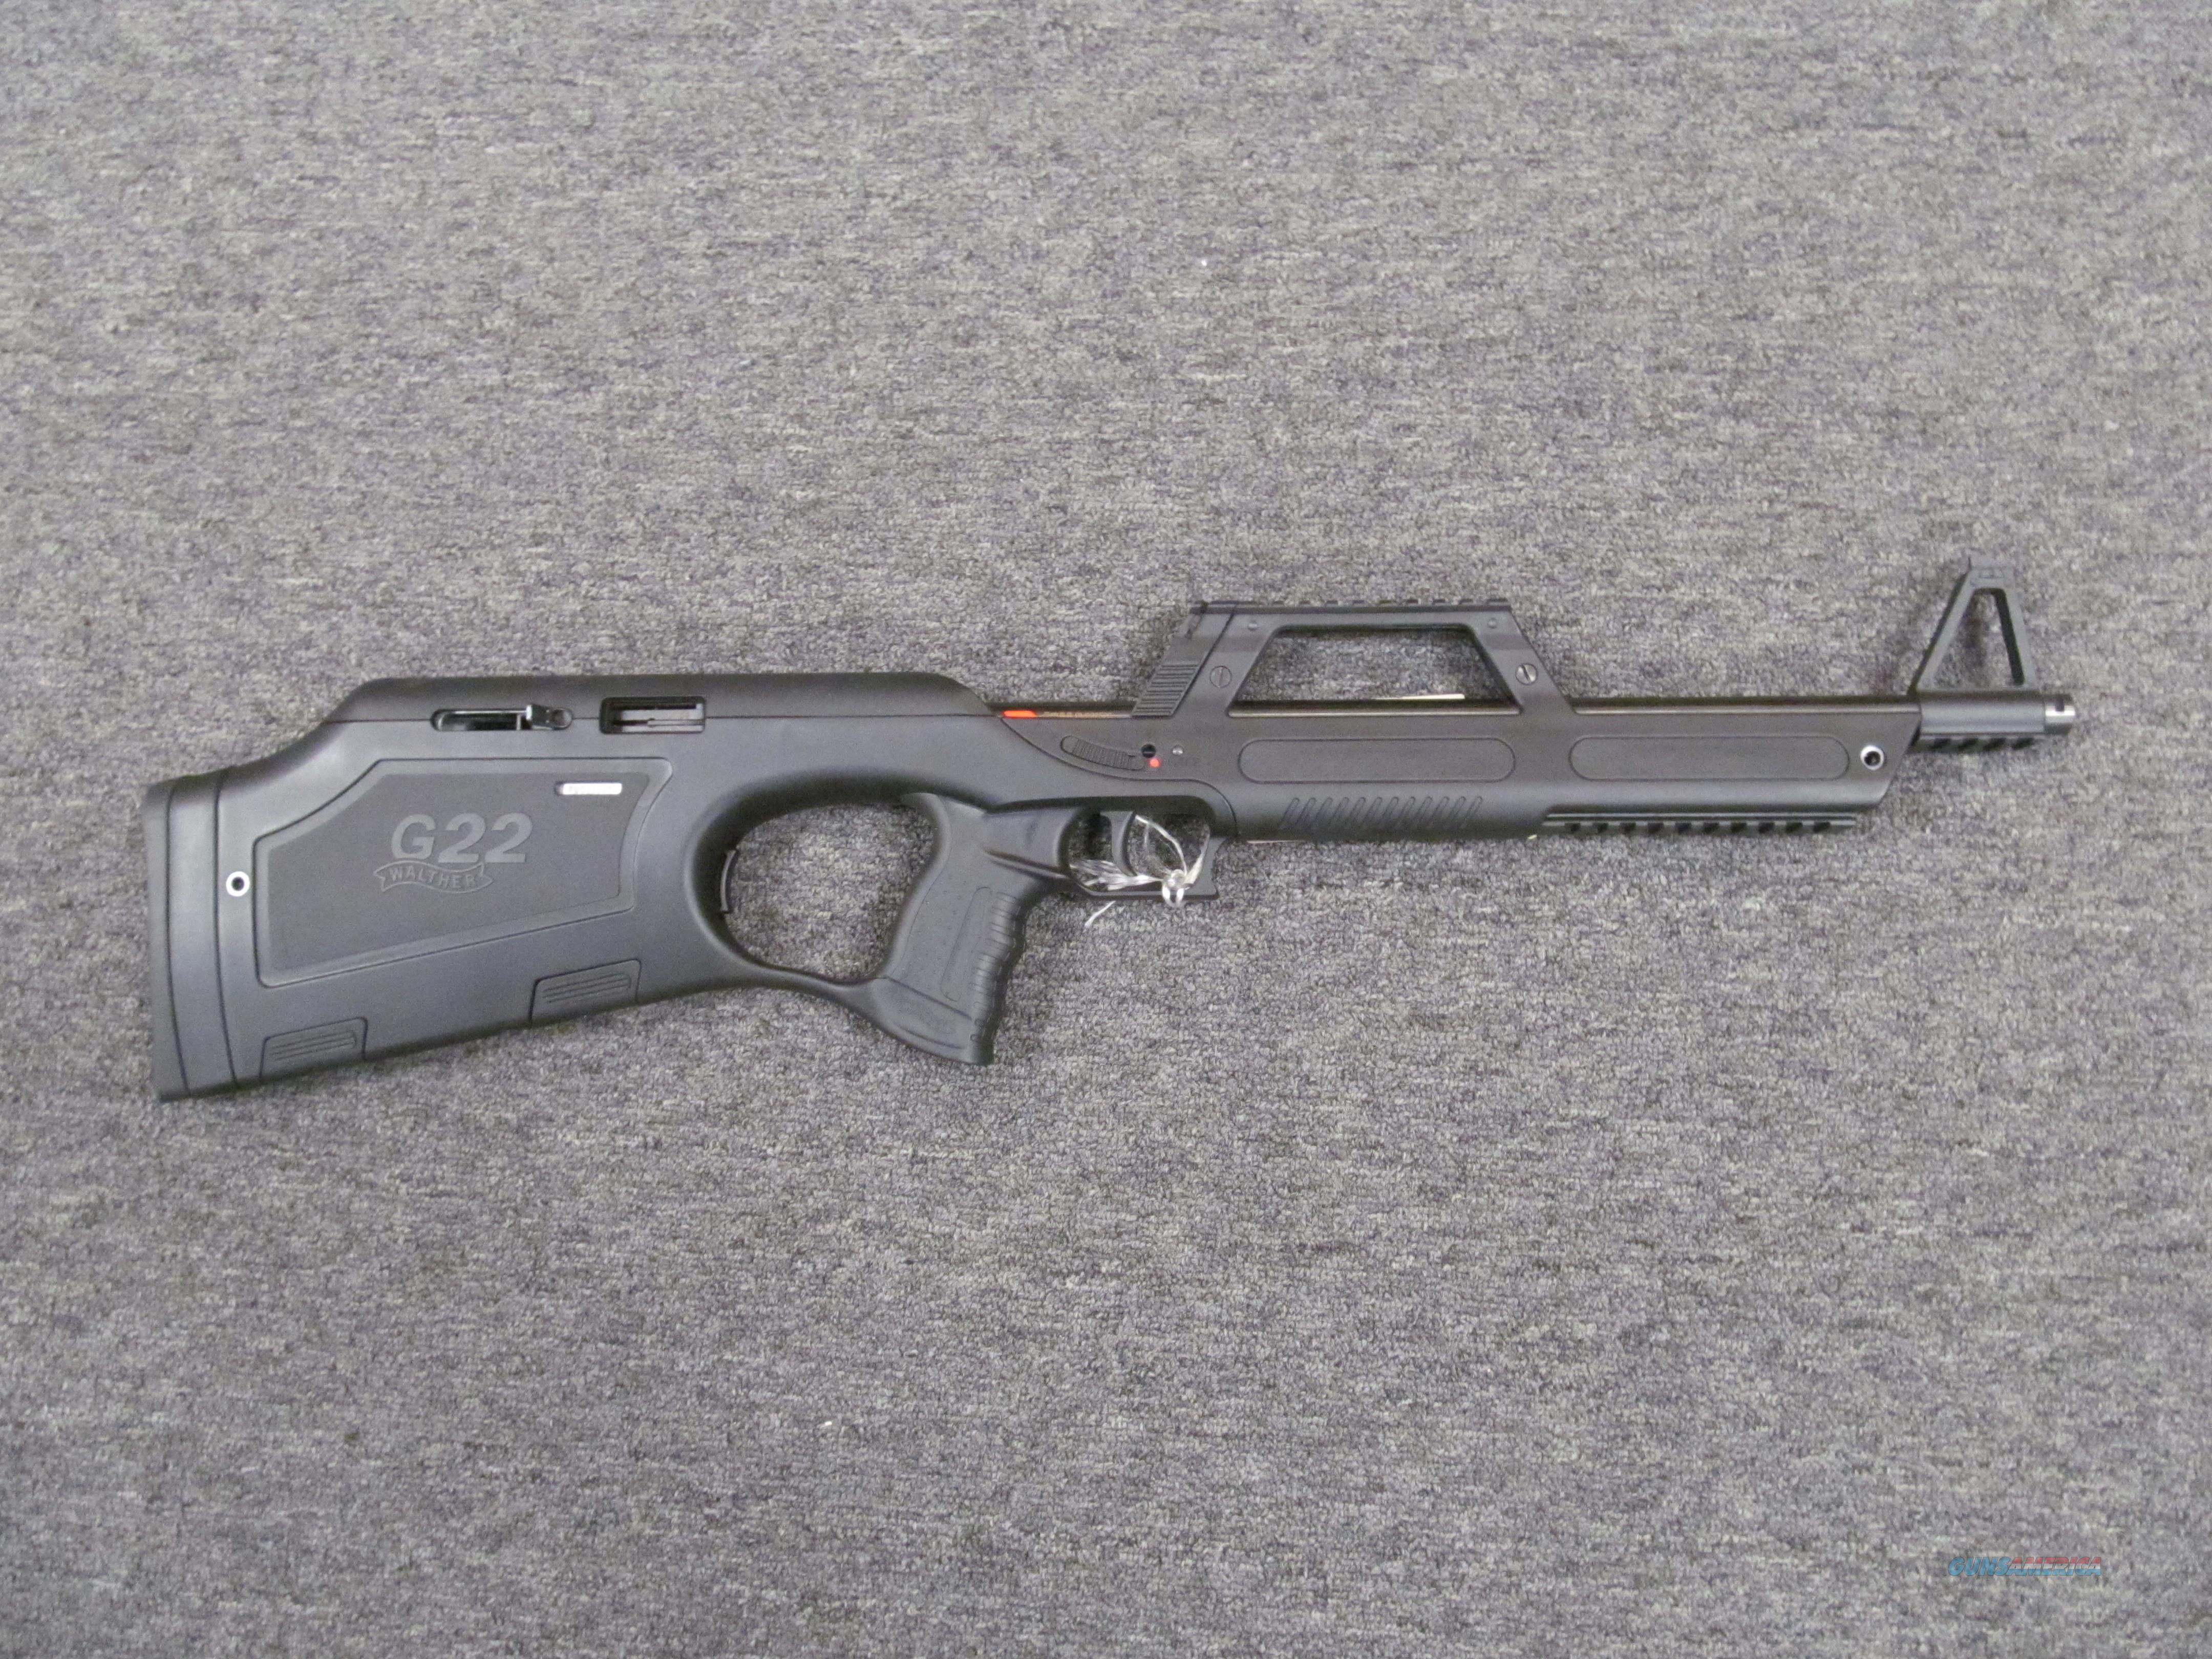 Walther G22  Guns > Rifles > Walther Rifles > Umarex